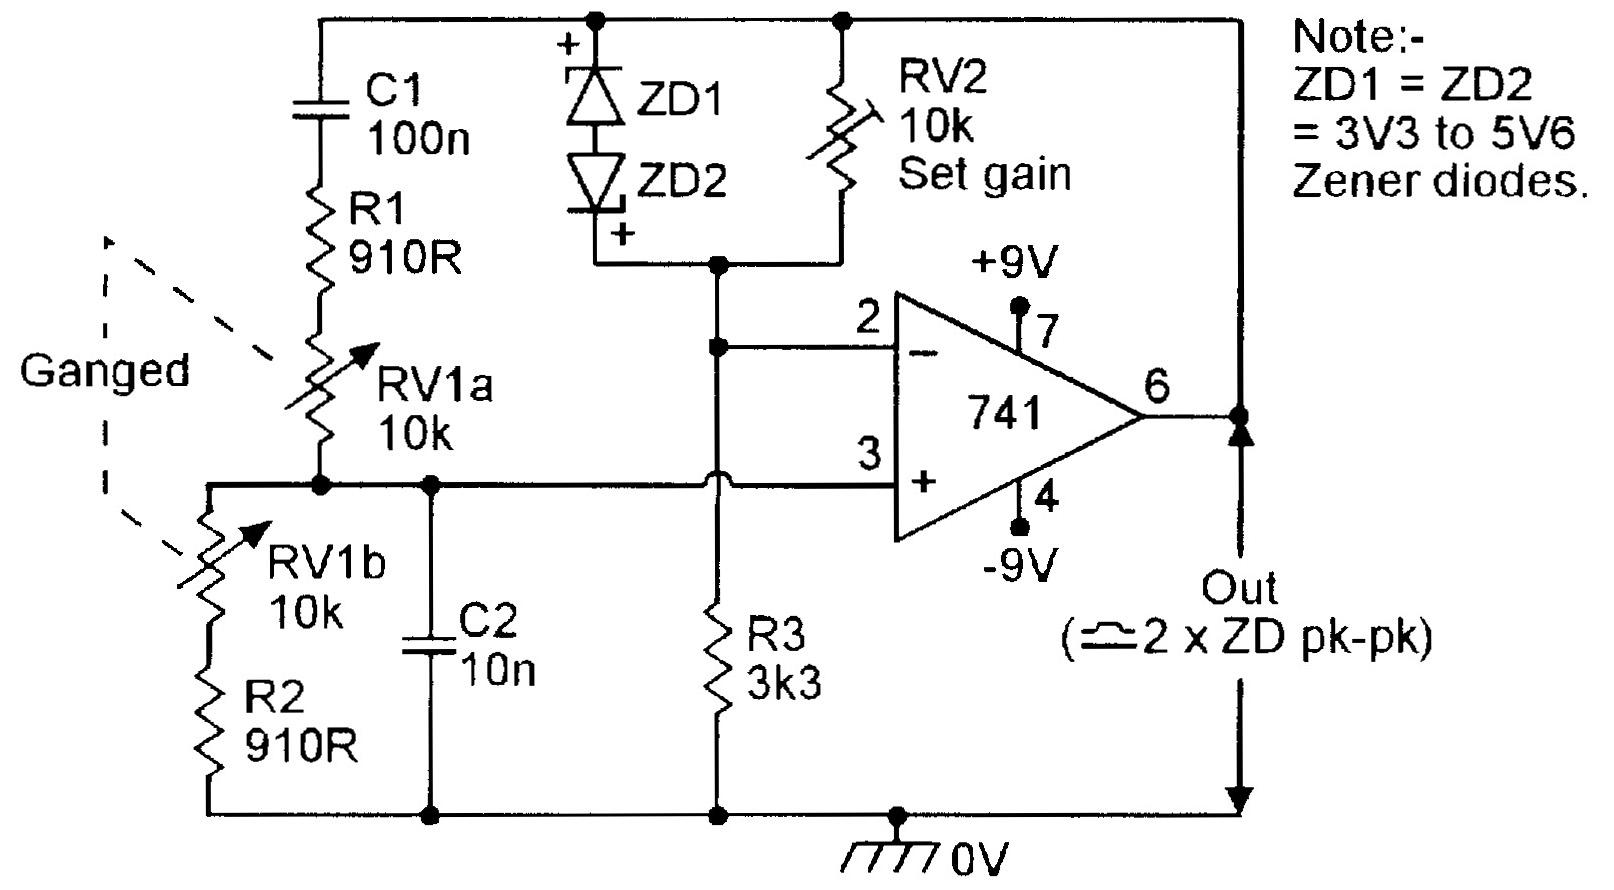 zener diode circuits